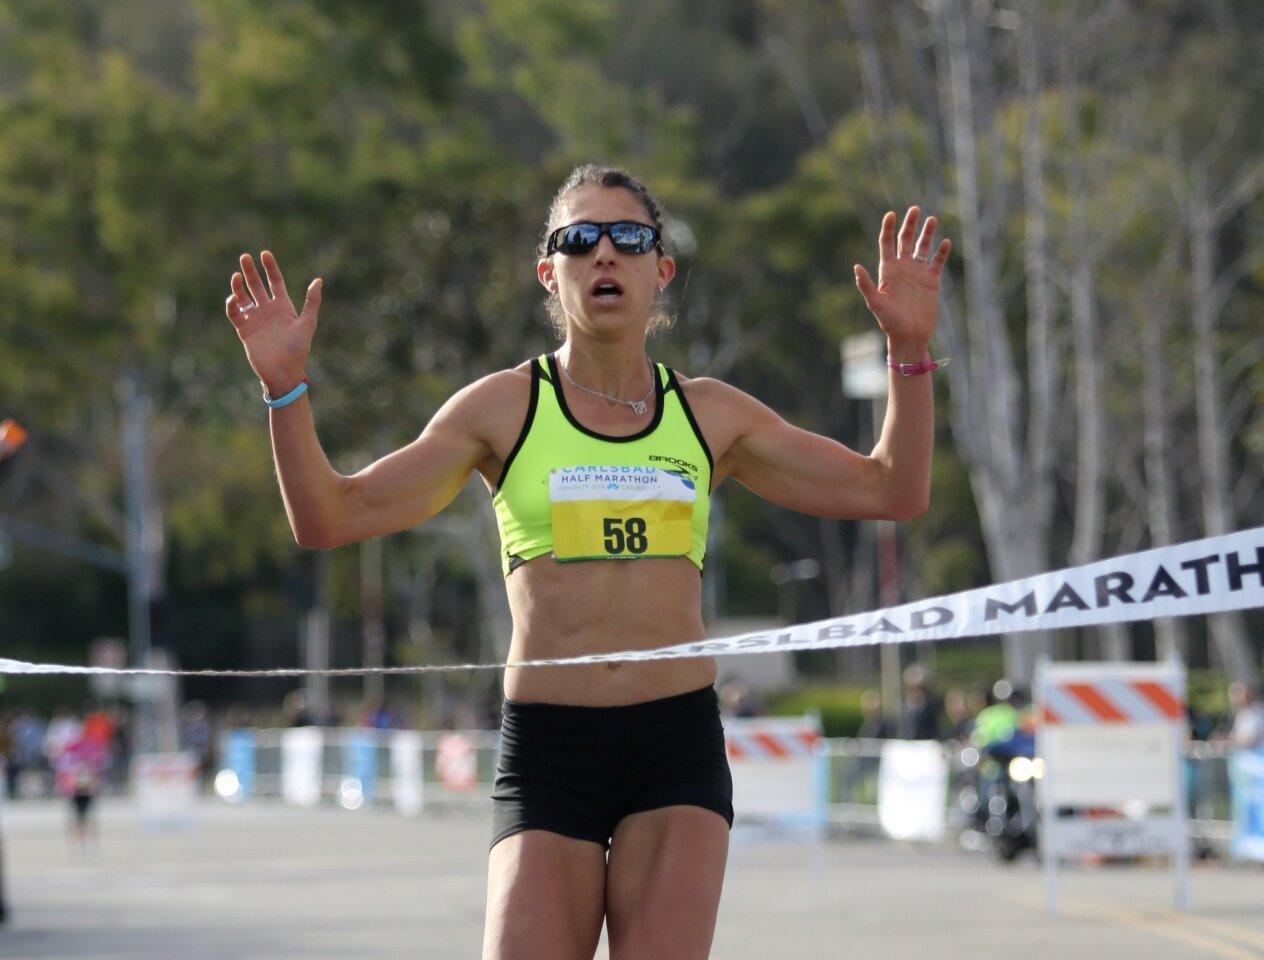 Natasha LaBeaud Anzures, of San Diego was the women's winner of the 2014 Tri-City Medical Center Carlsbad  Half Marathon.